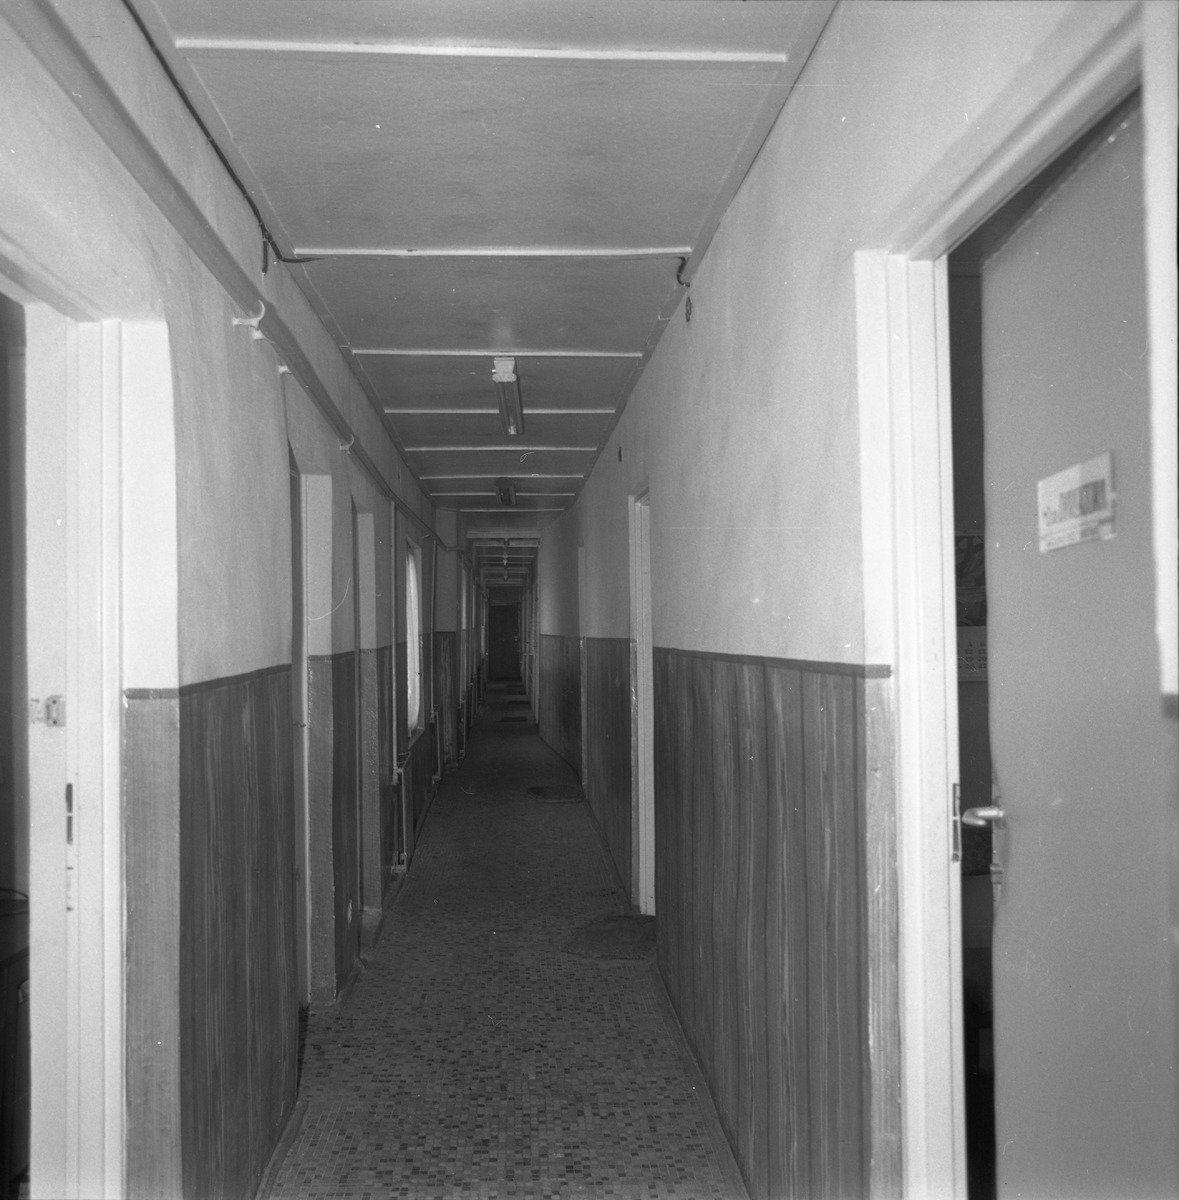 Biuro bazy transportowej [3]